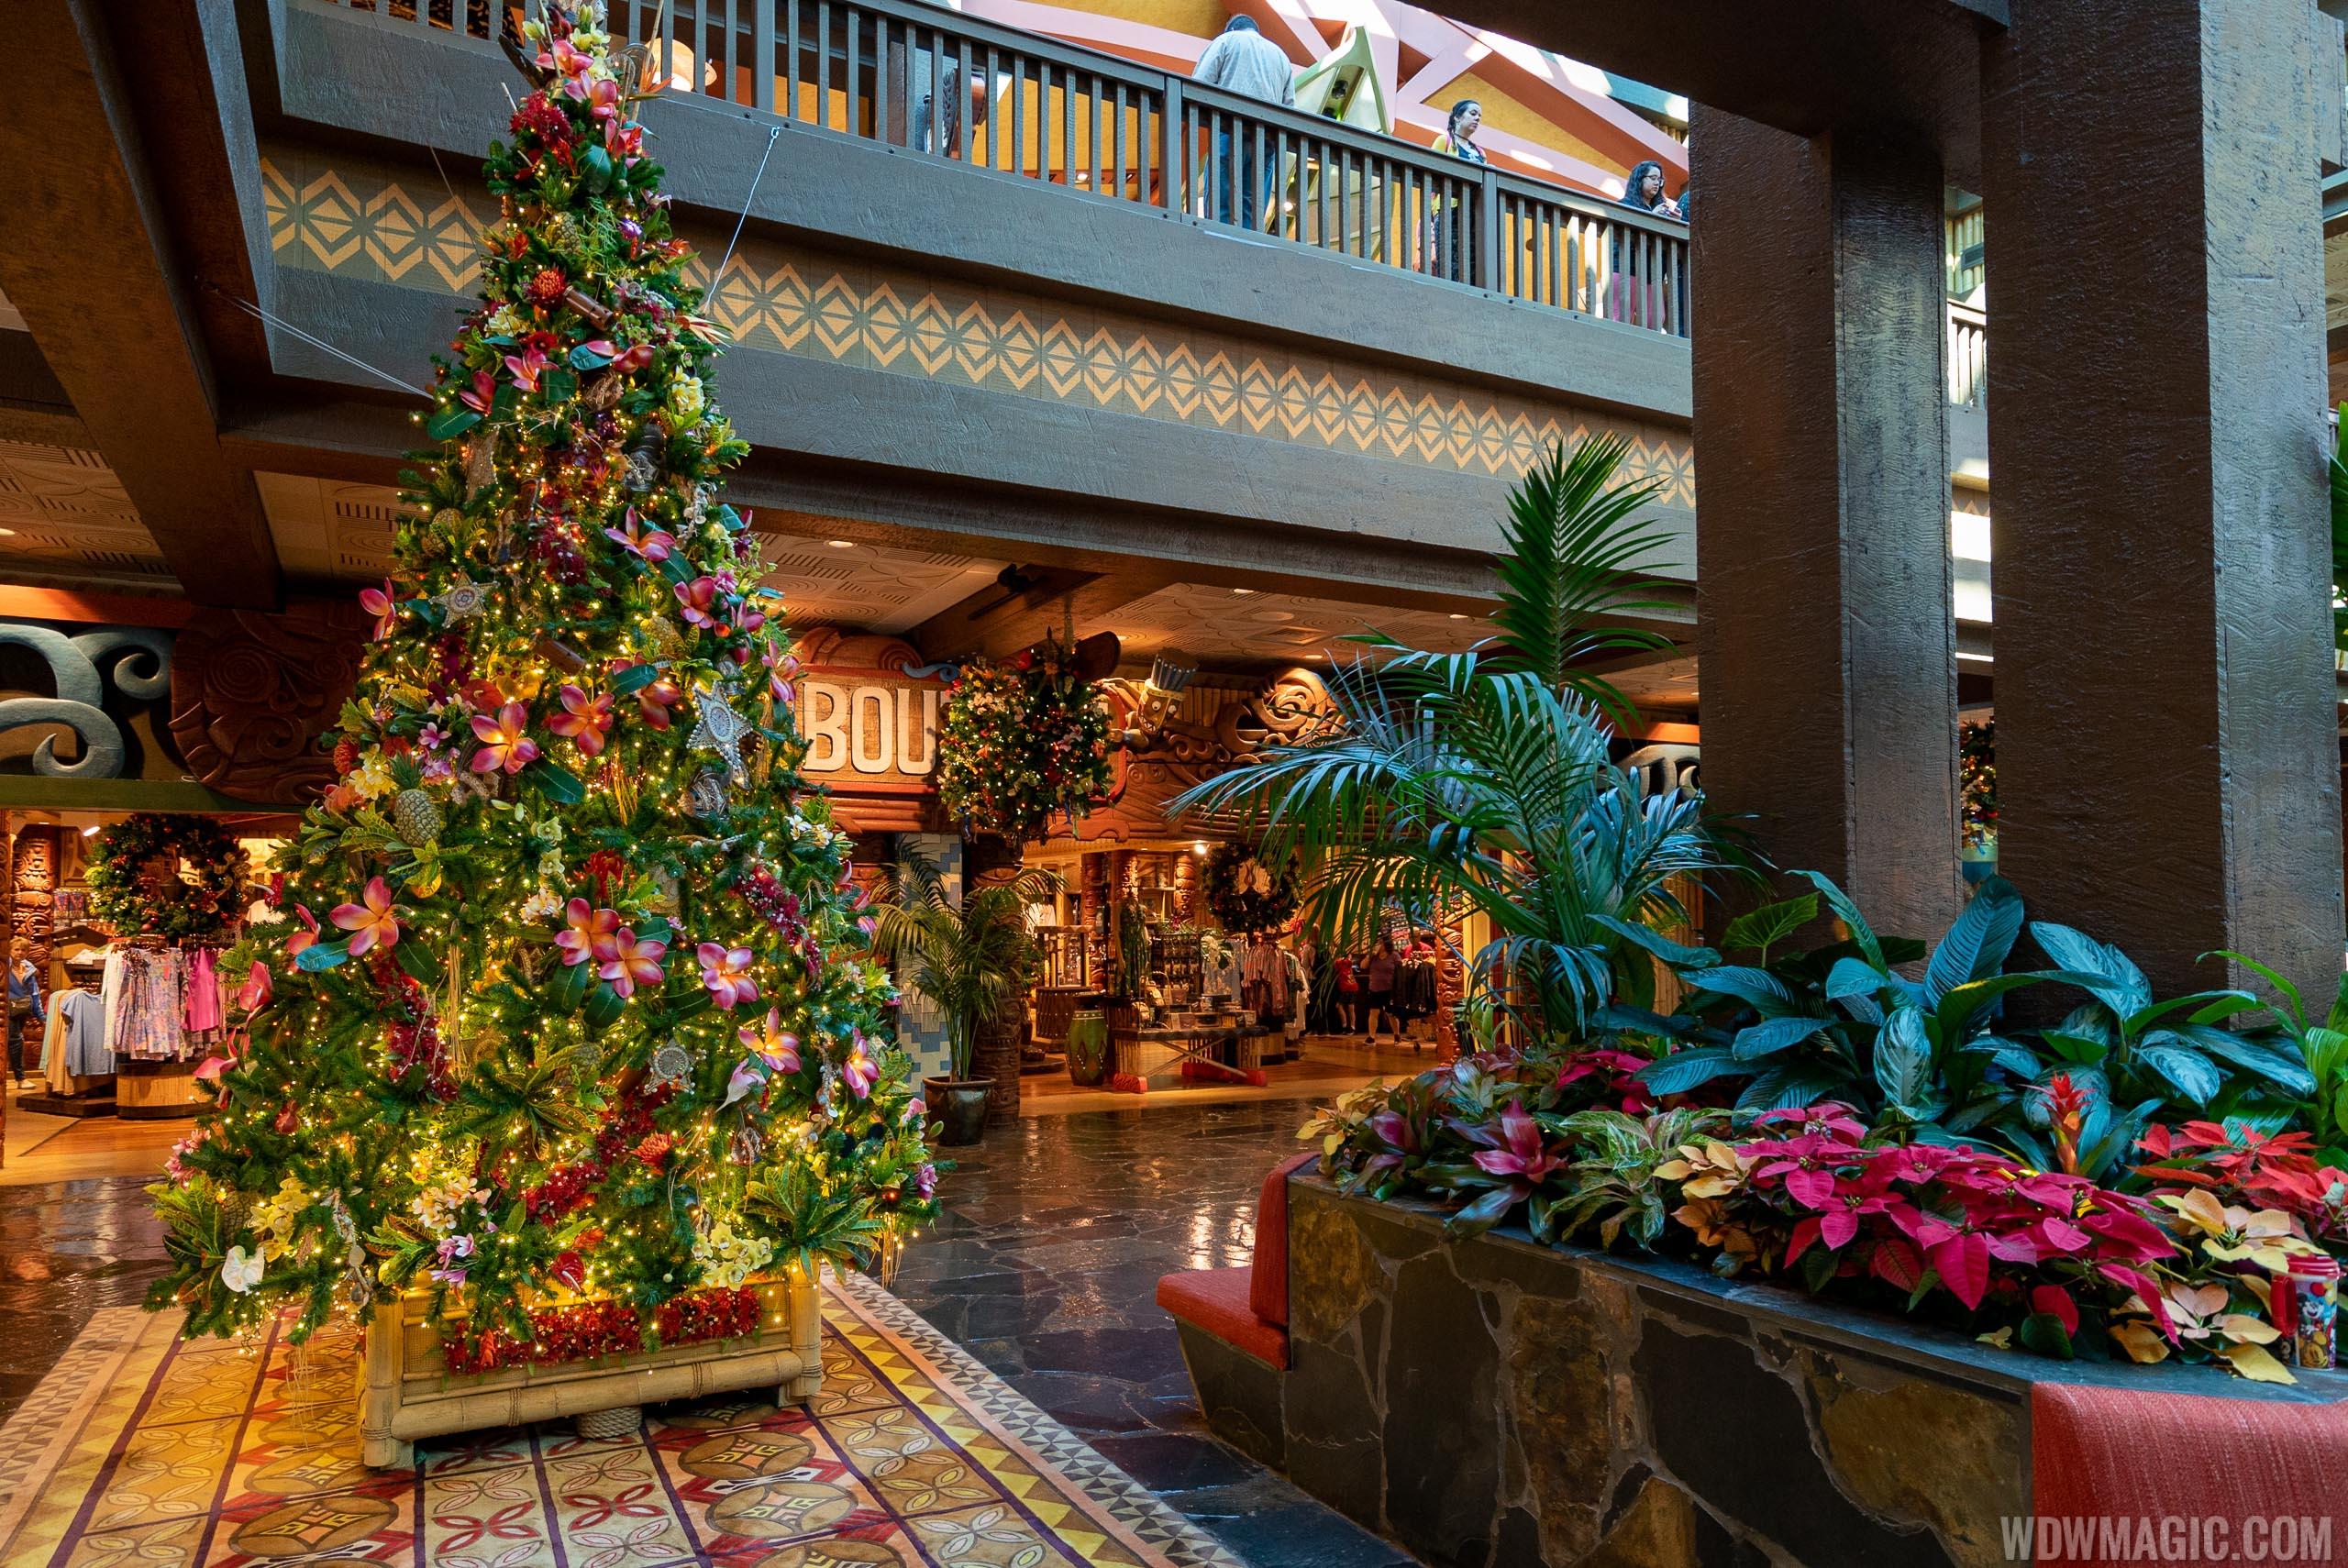 Disney's Polynesian Village Resort holiday decorations 2019